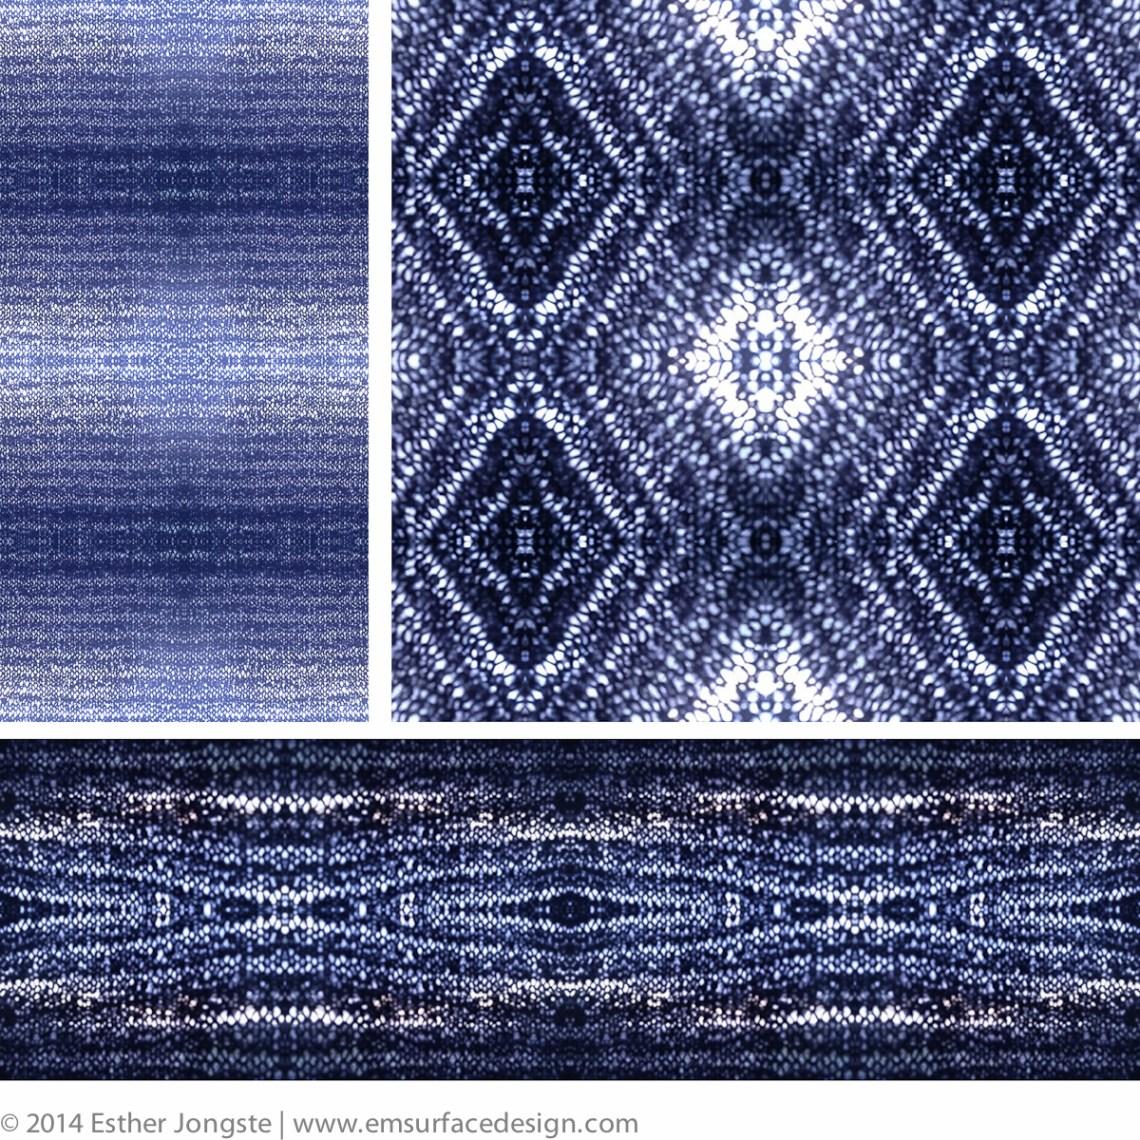 201405-2-knitting-collage-2-1200